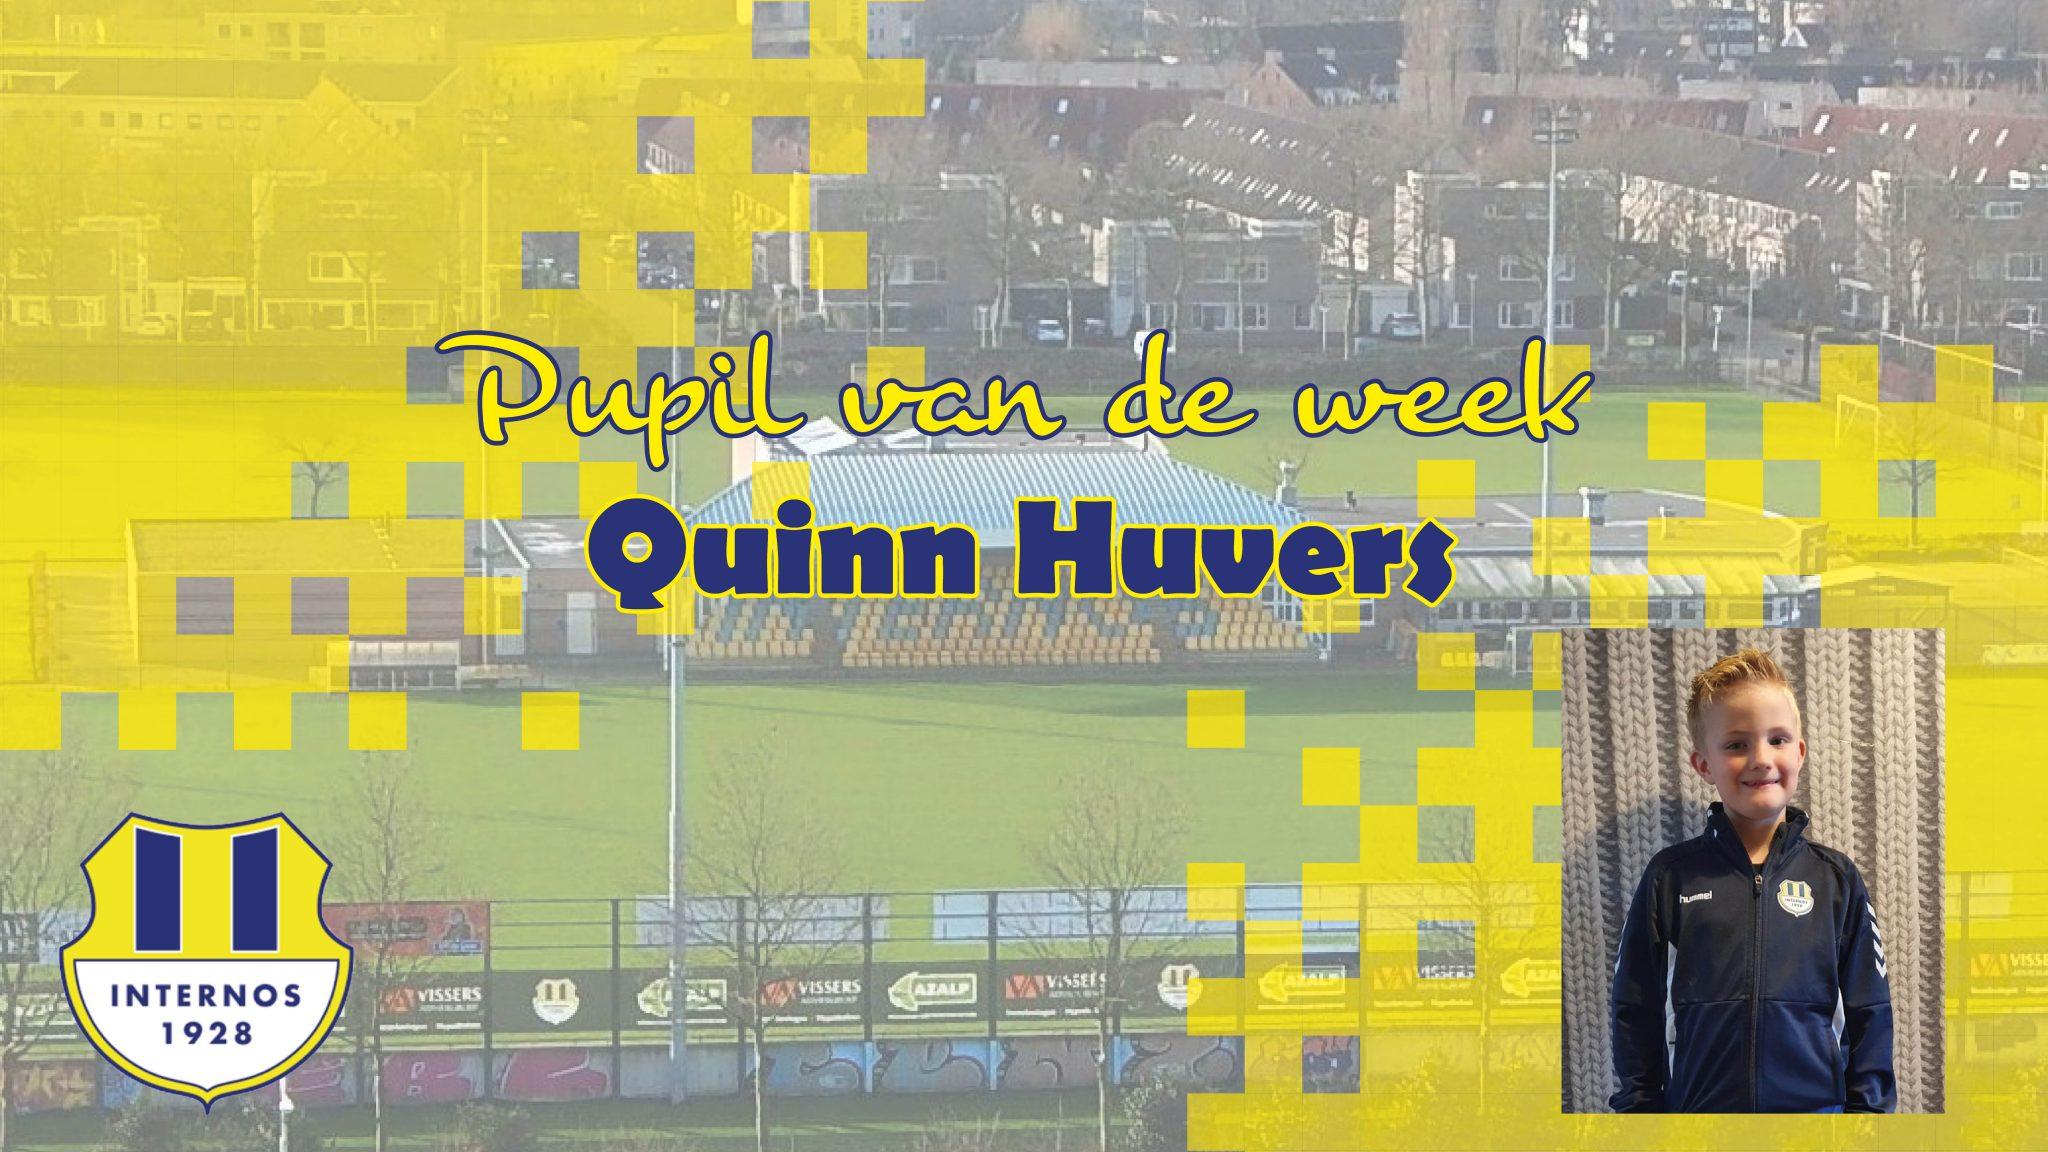 Pupil van de week: Qiunn Huvers